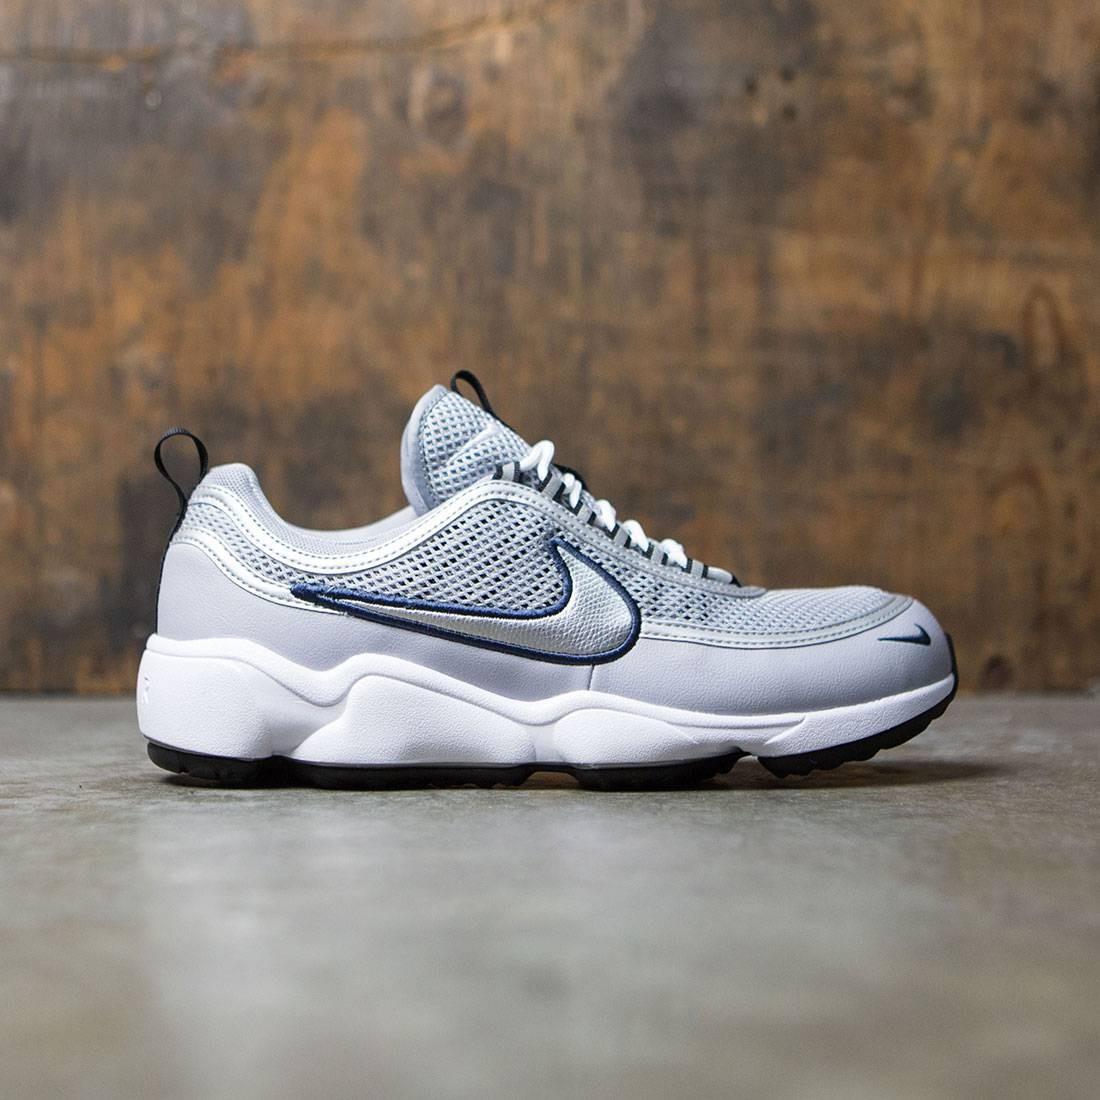 929dc7f416d2 ... Nike Women Air Zoom Spiridon (wolf grey metallic silver-black) ...